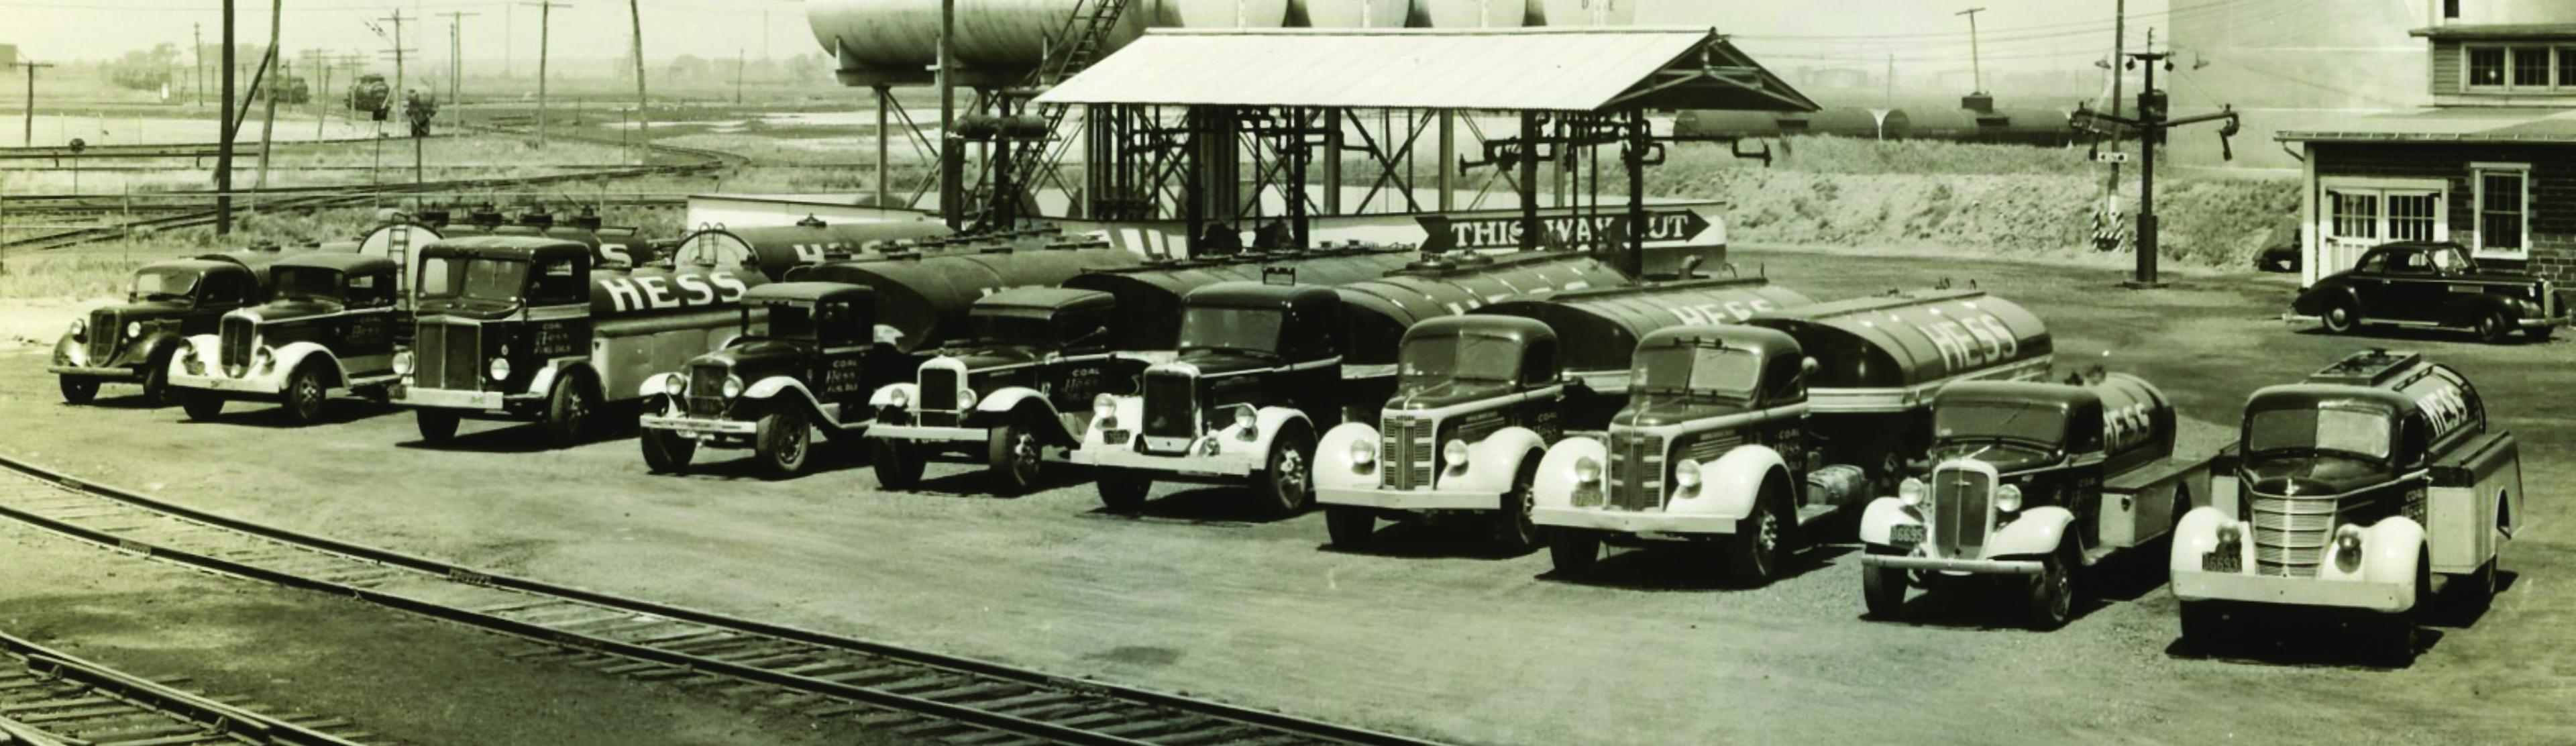 First Oil Terminal in Perth Amboy NJ